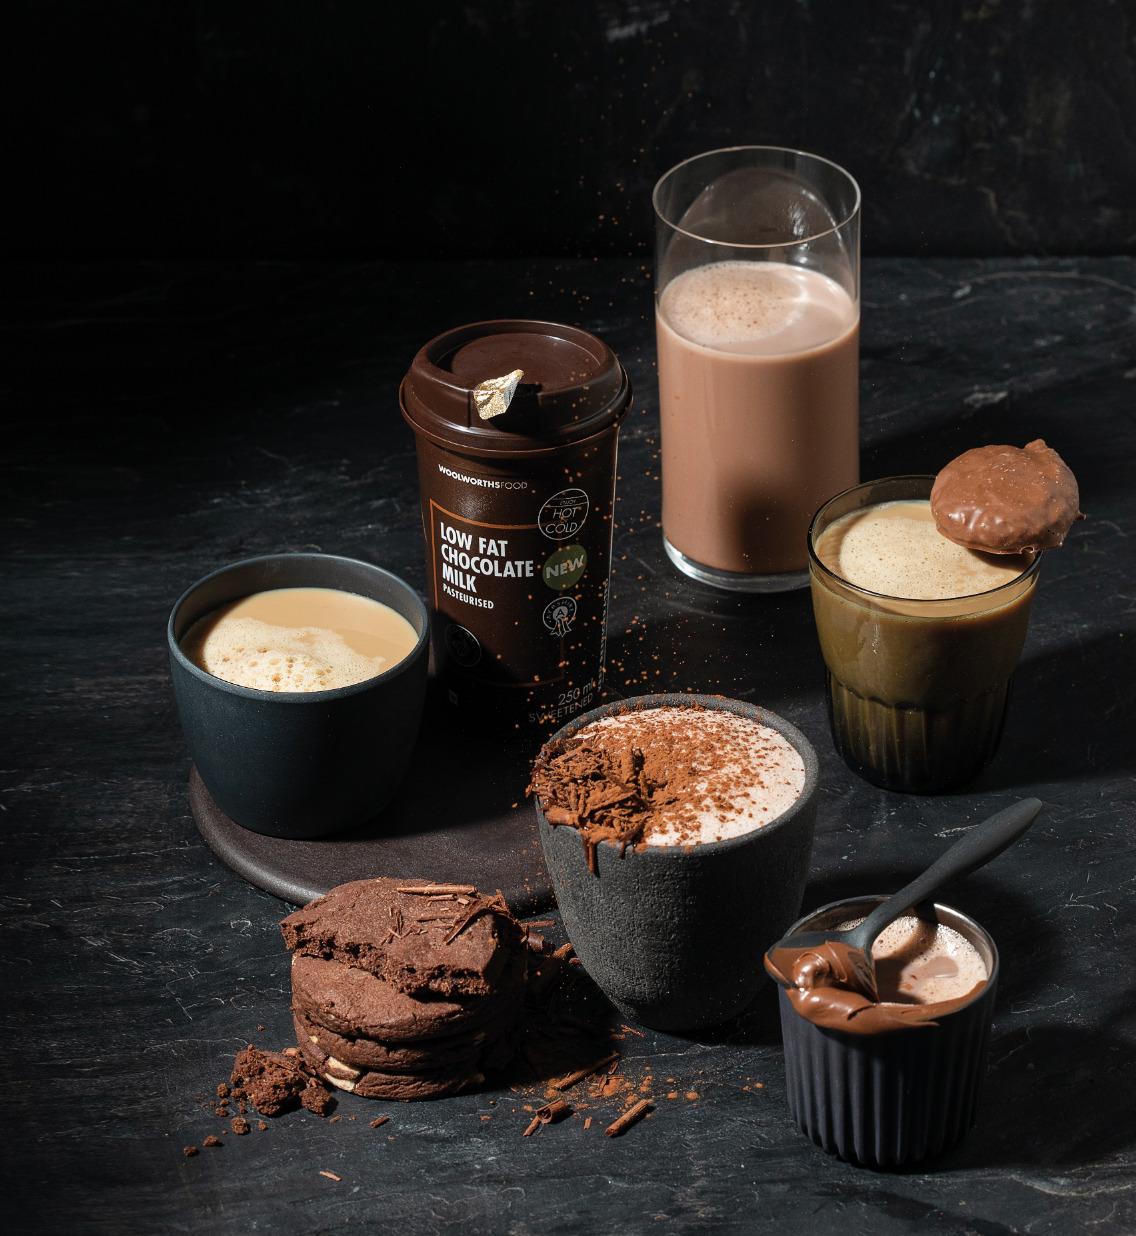 Ayrshire-low-fat-chocolate-milk